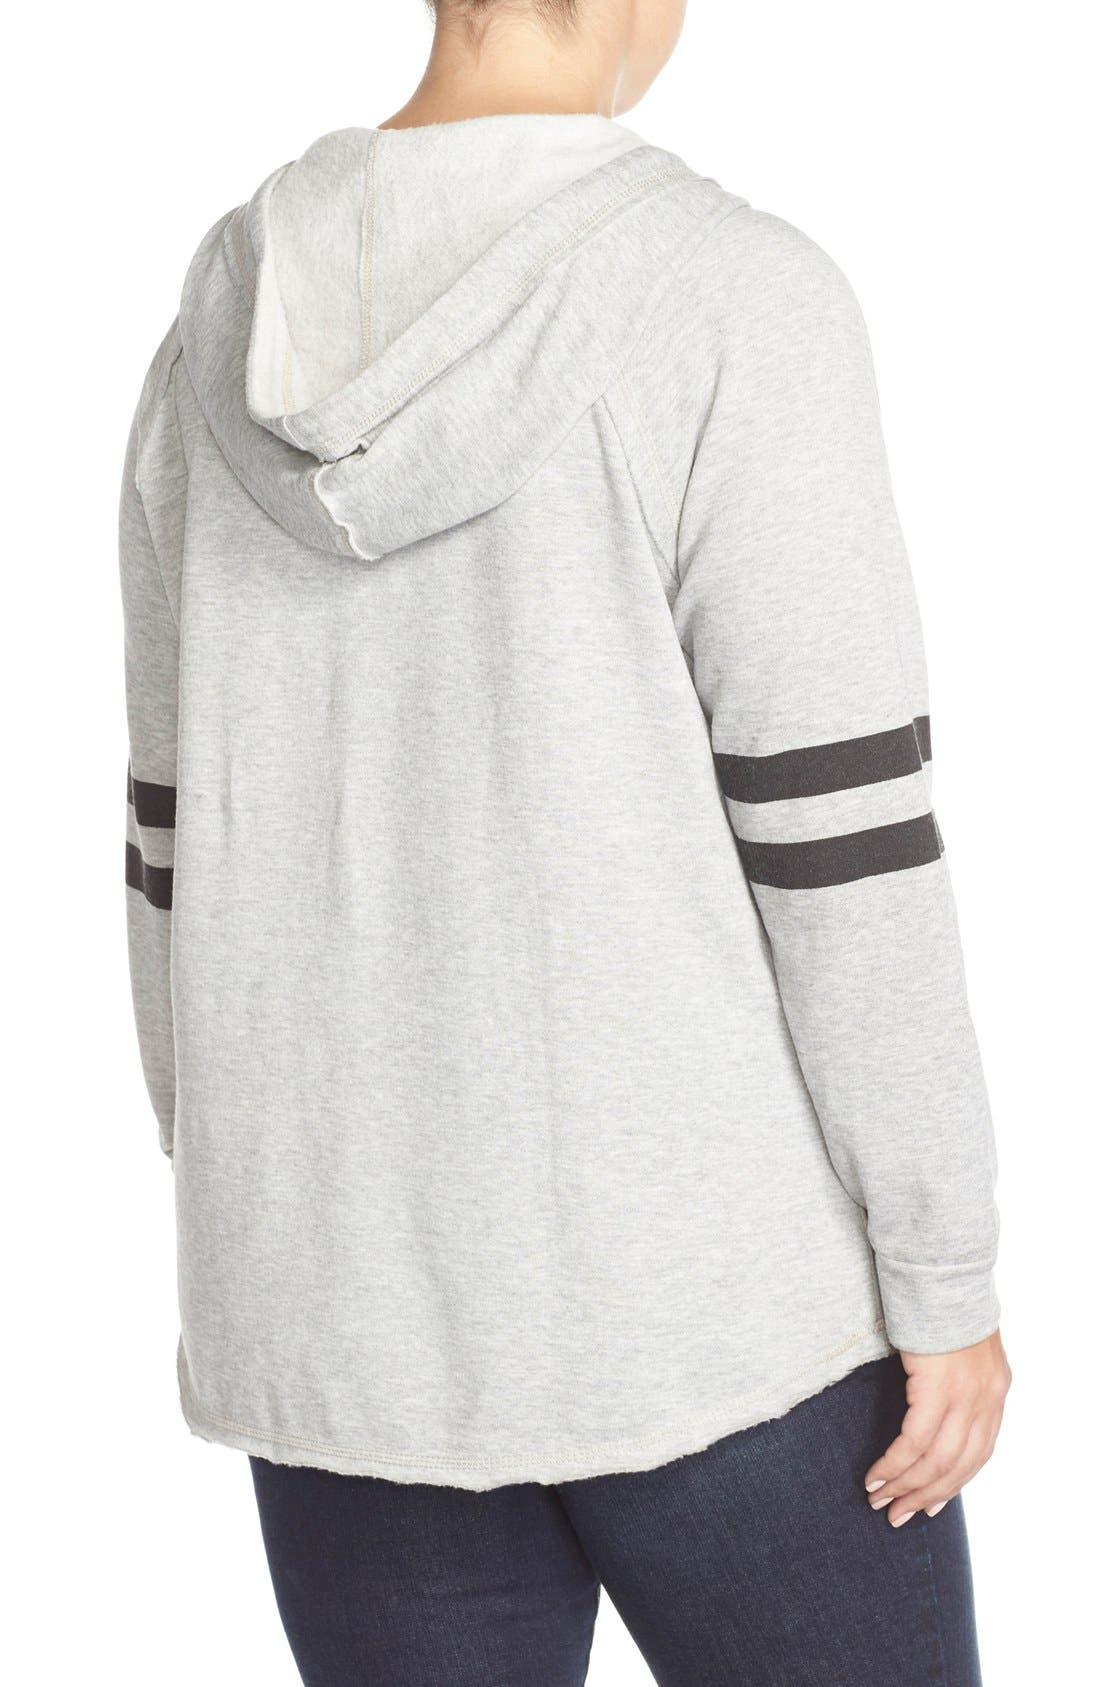 'Love Ya, Mean It' Hooded Sweatshirt,                             Alternate thumbnail 9, color,